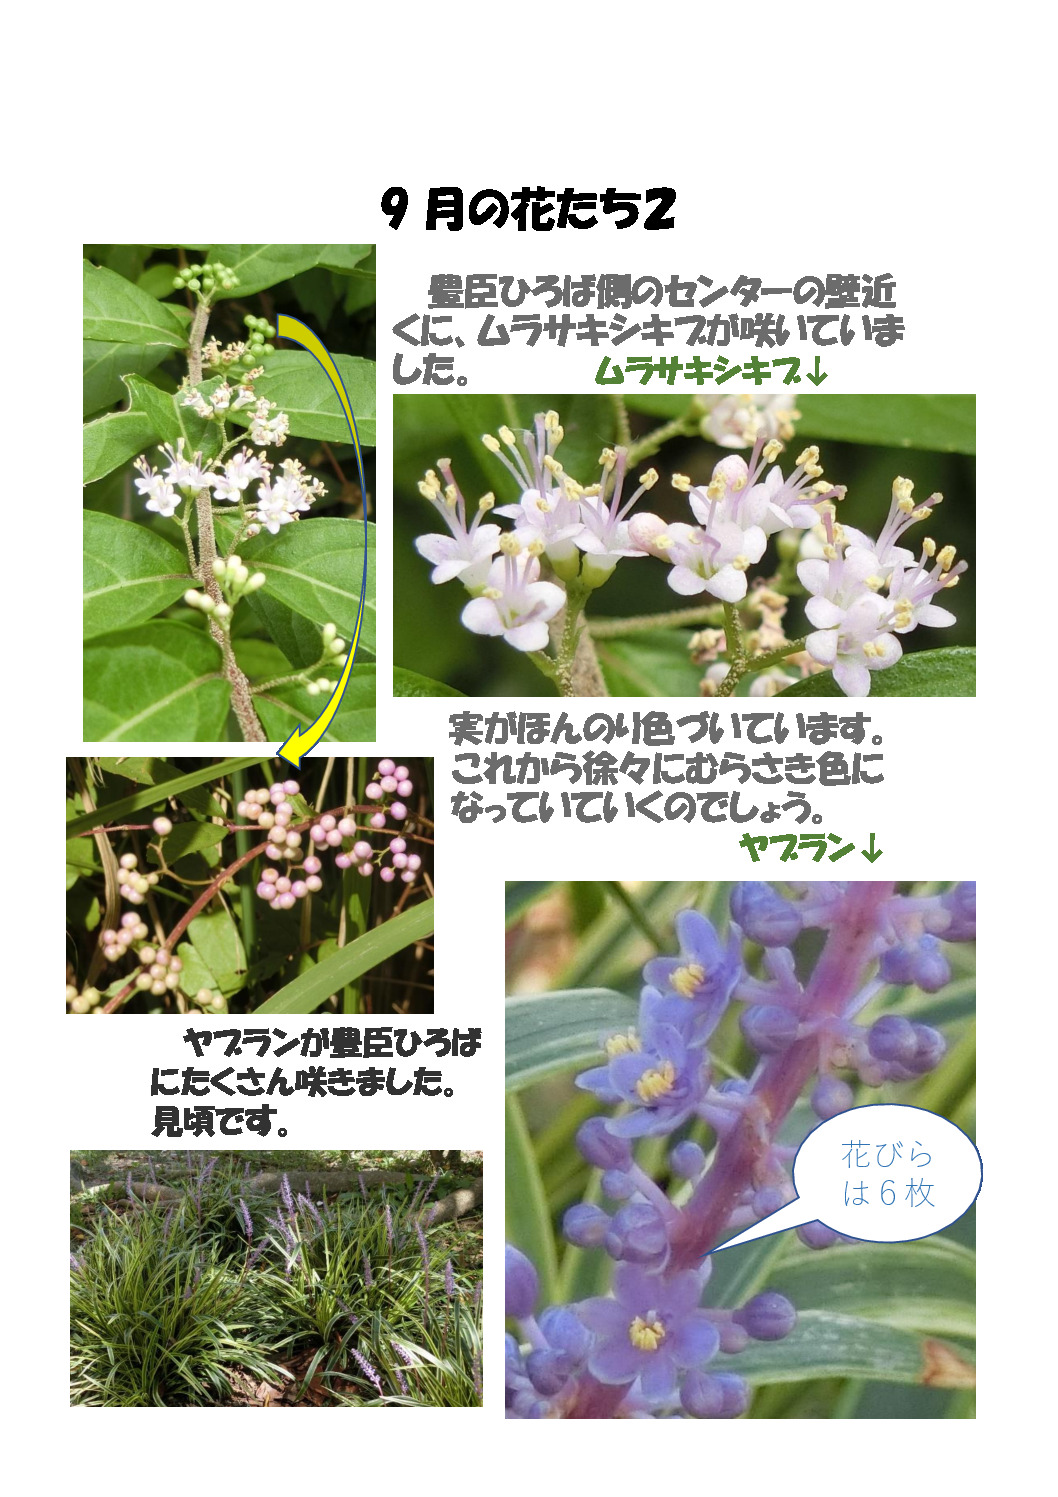 thumbnail of 9月の花たち 2